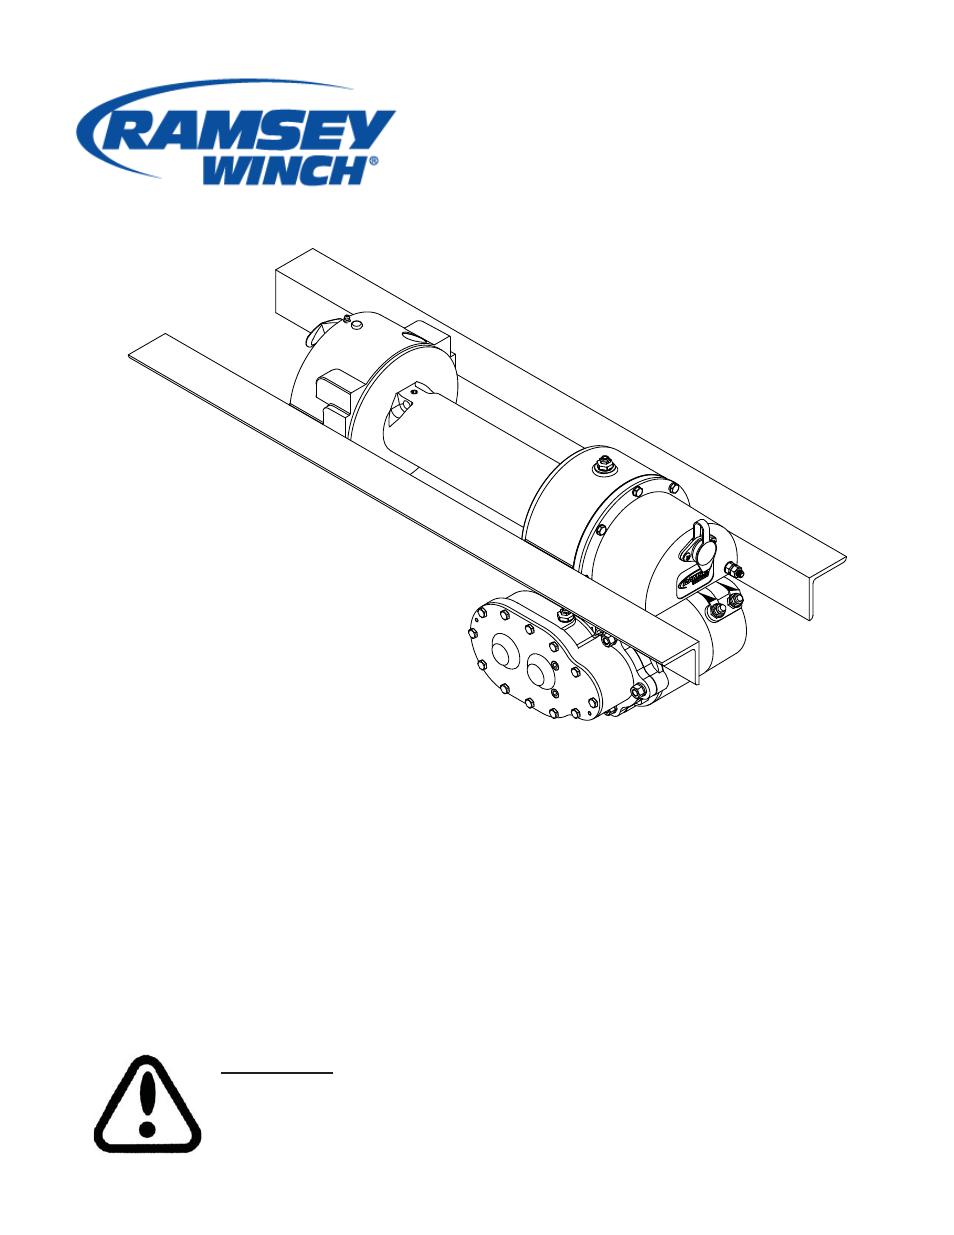 Ramsey Winch Wiring Diagram Ram Library Of Diagrams Pierce Dc 200 Series Lok User Manual 28 Pages Rh Manualsdir Com